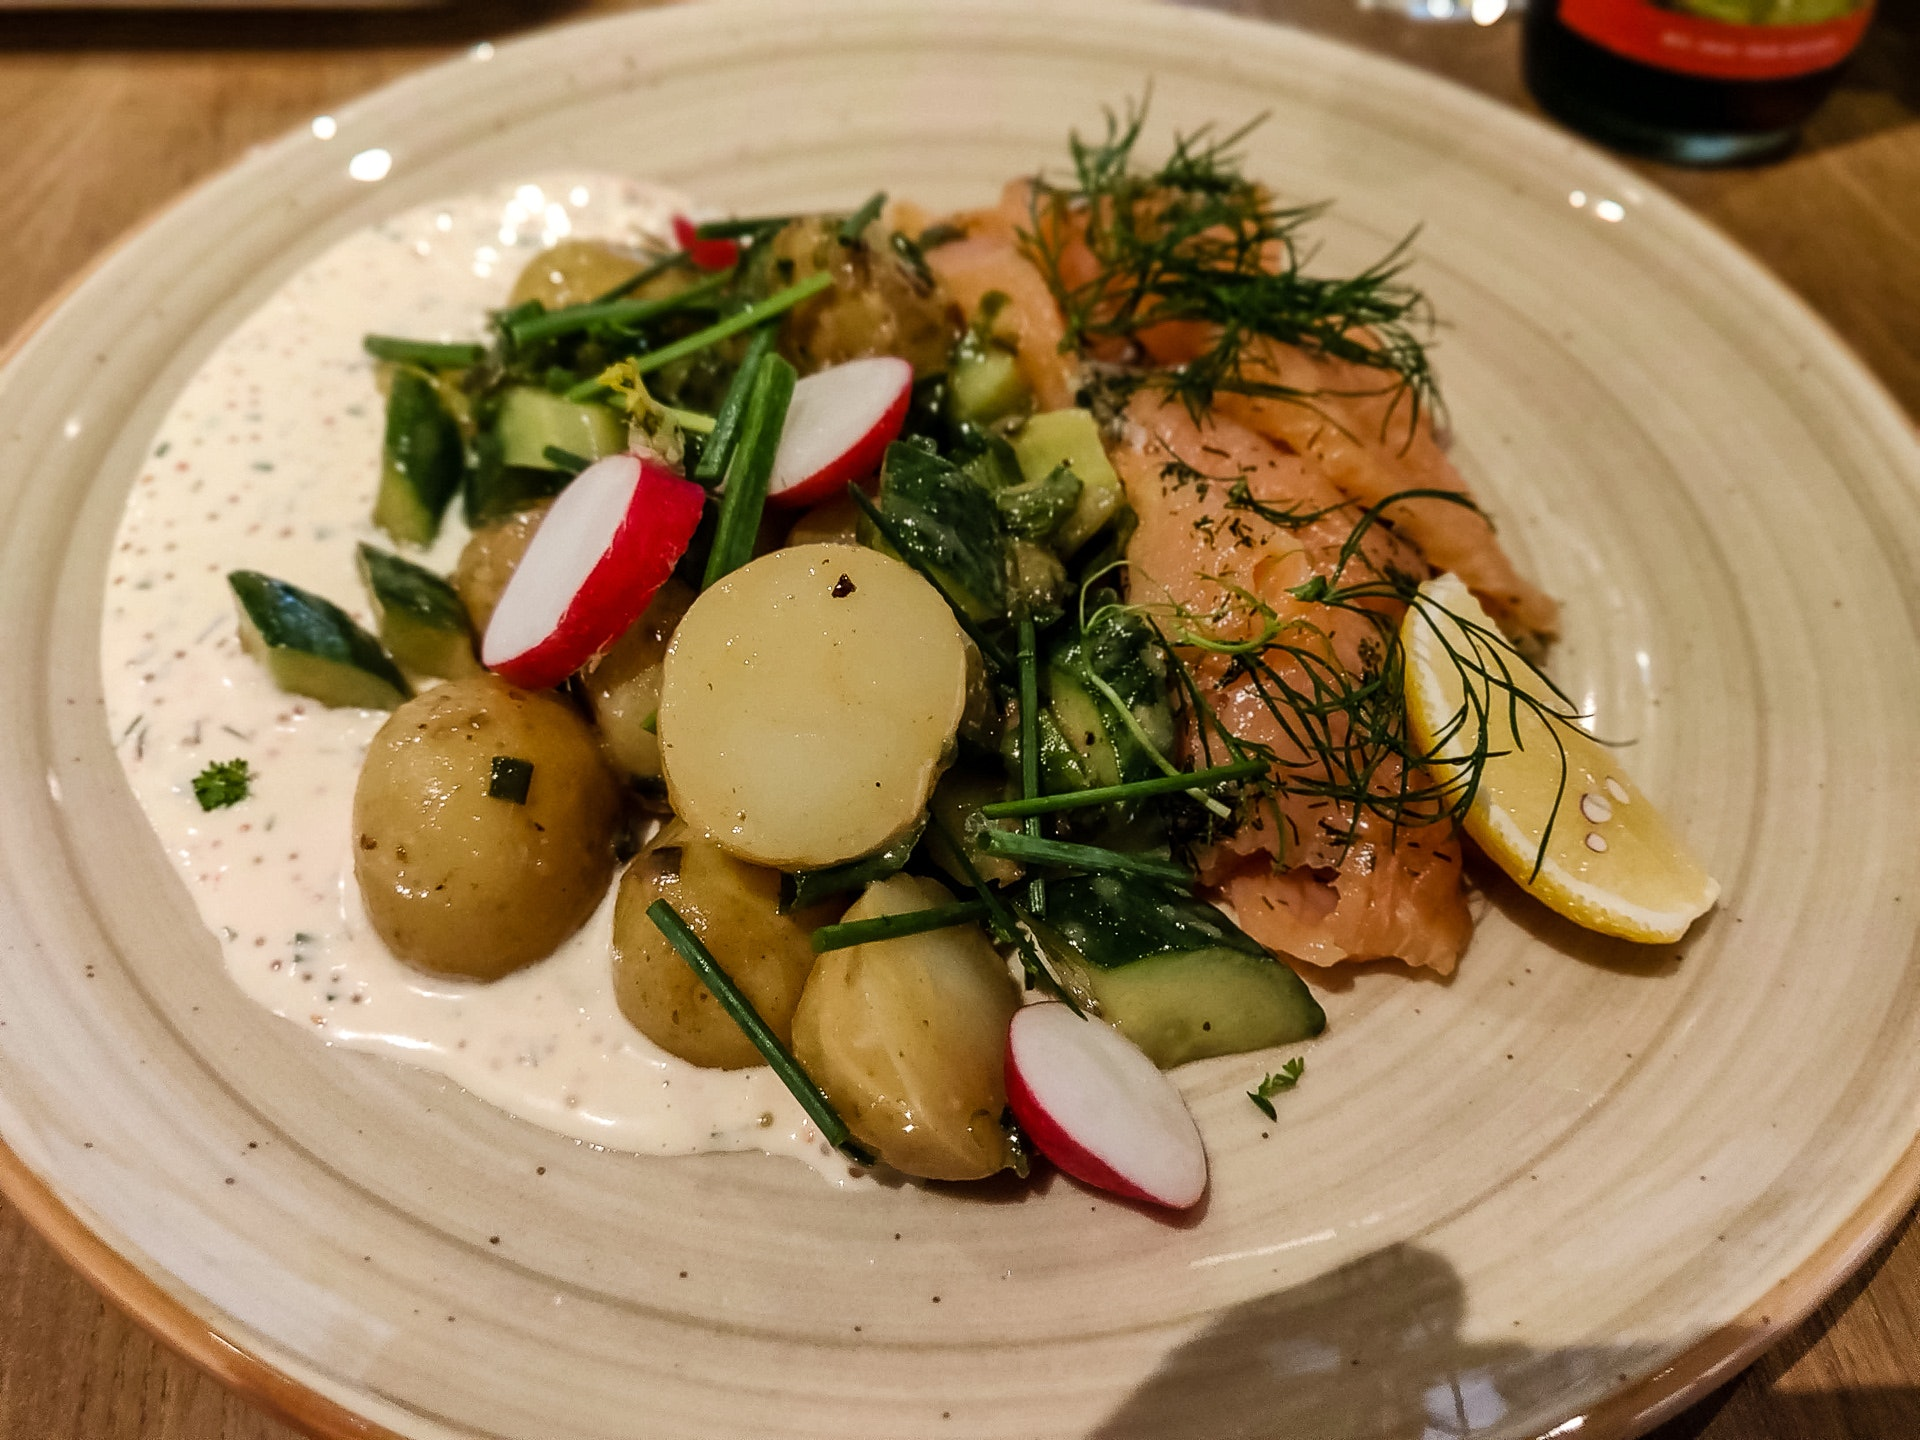 Lunch at Kalmar Slott Cafe